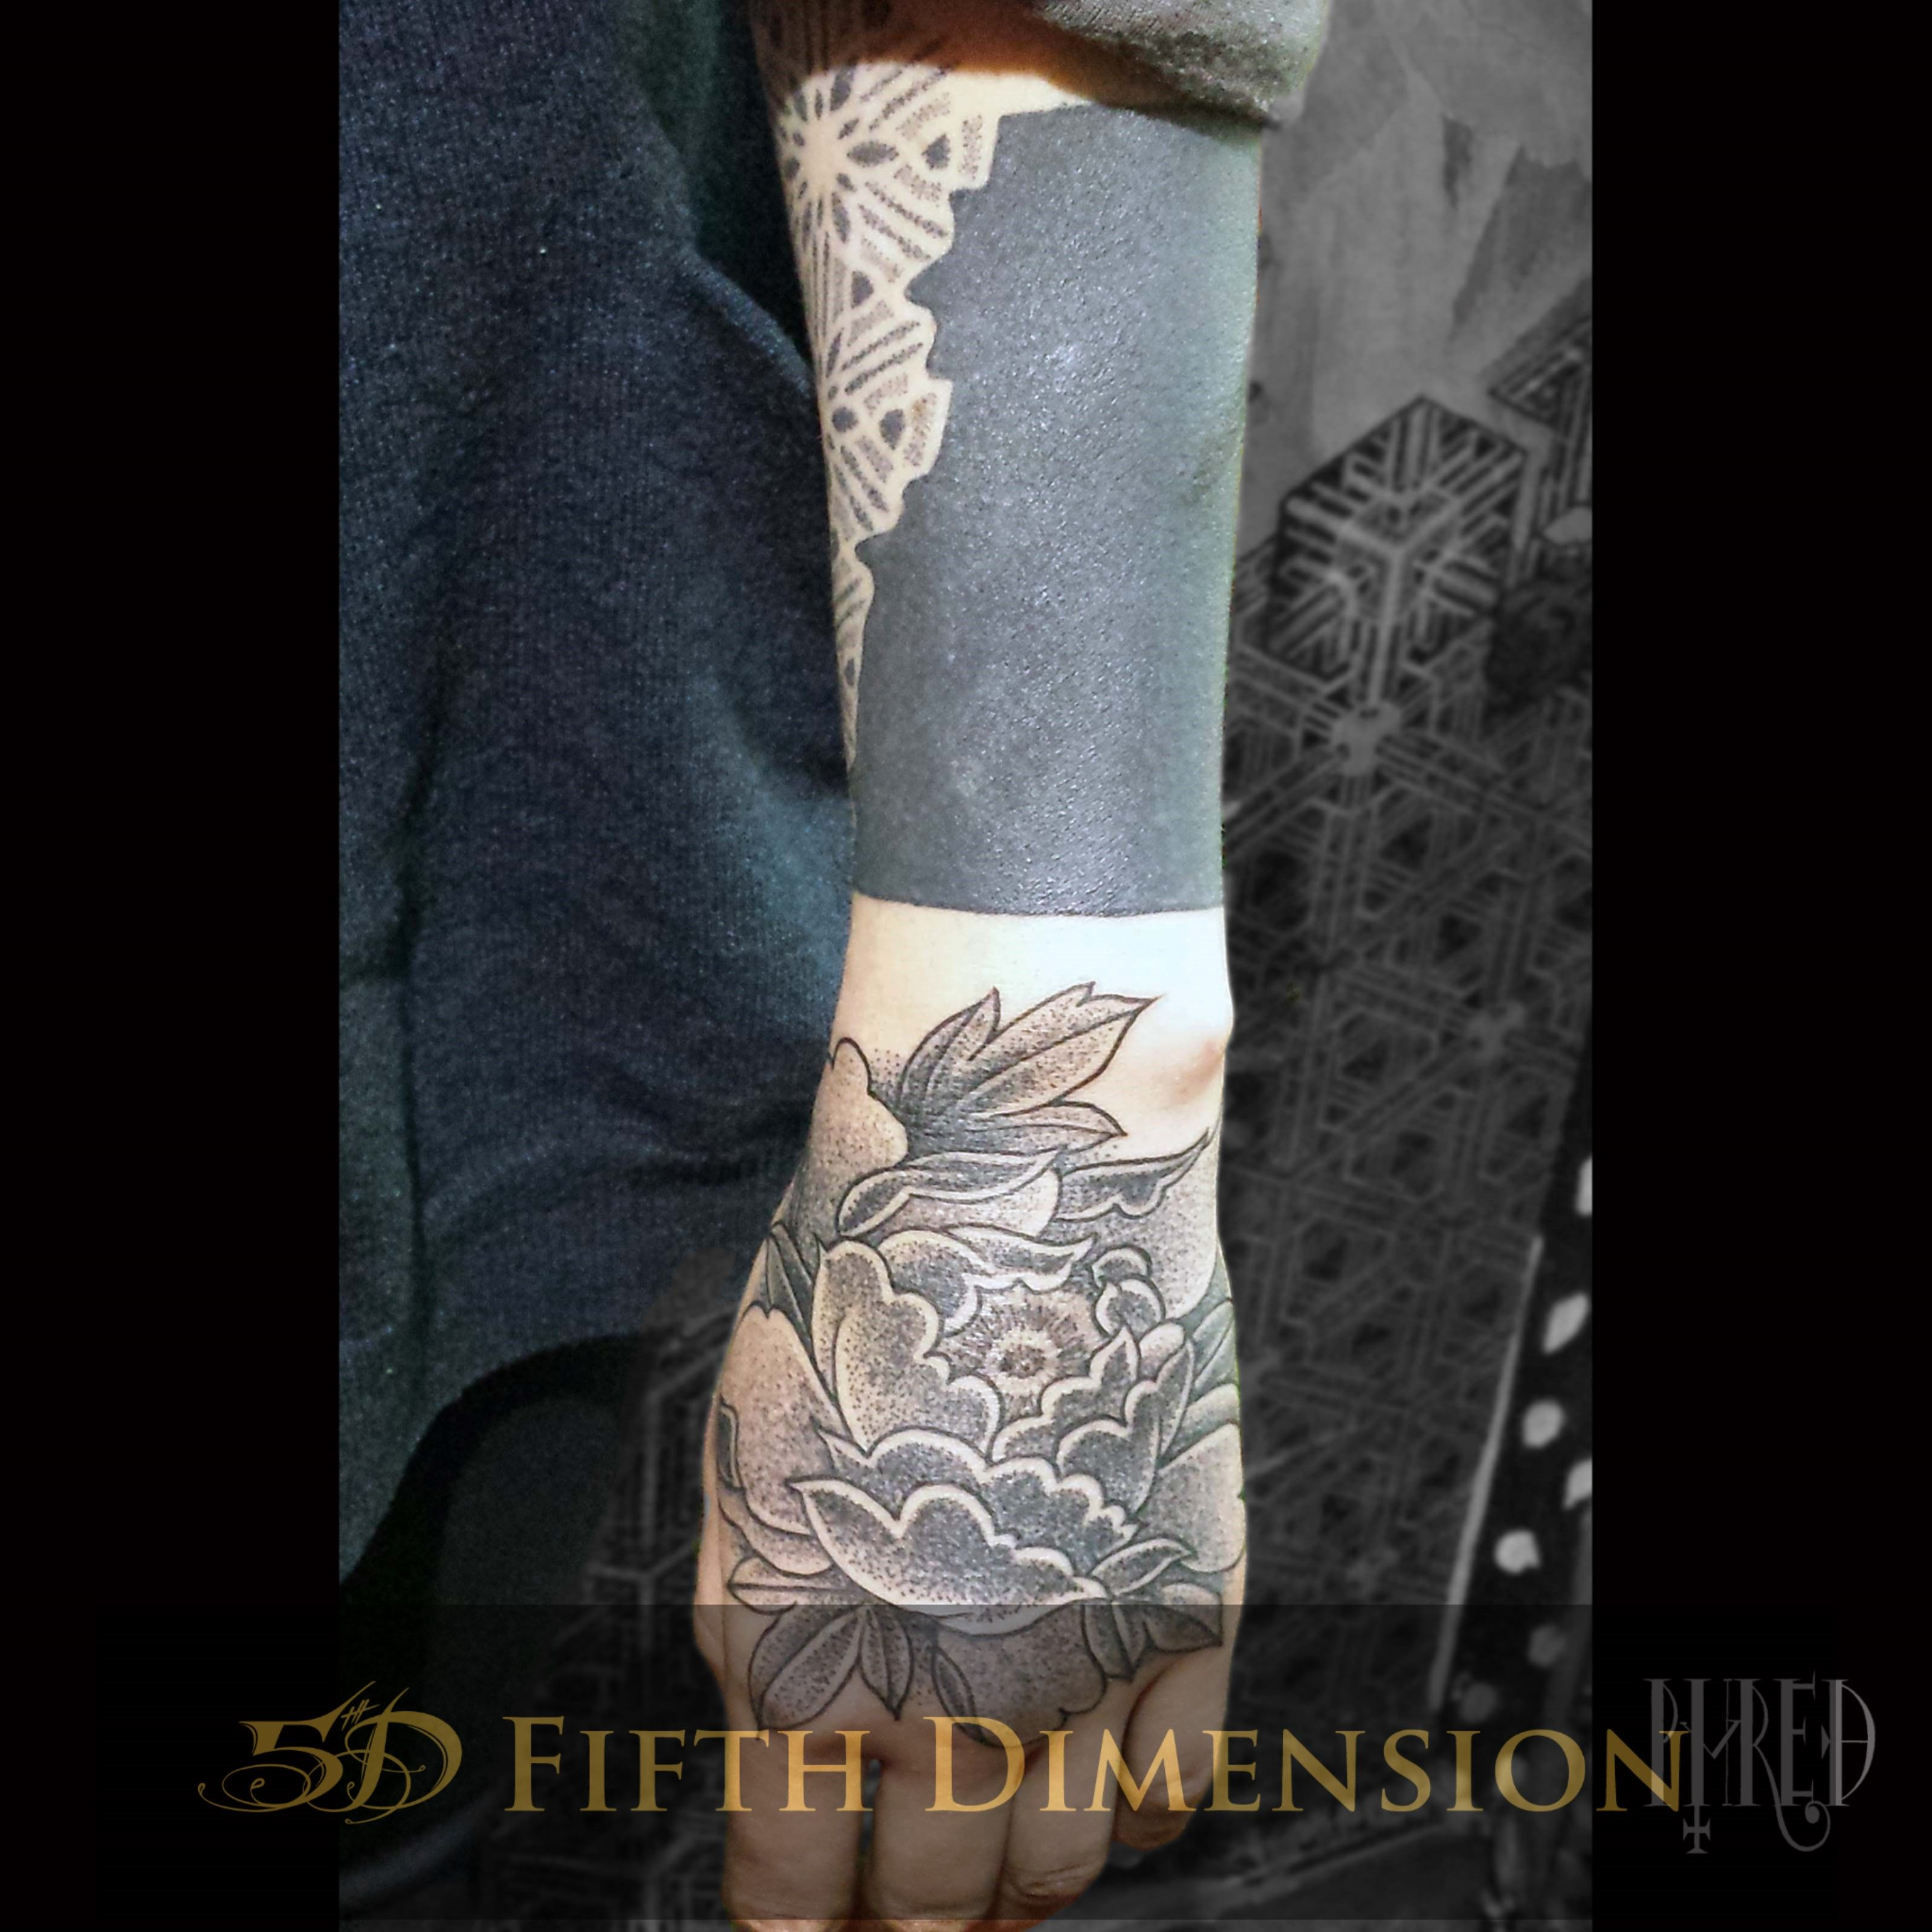 Tattoo By Phred Blackout And Rose Londontattoo Blackandgreytattoo Dotworktattoo Eastlondon Shoreditch London Tattoo Vegan Tattoo Black And Grey Tattoos